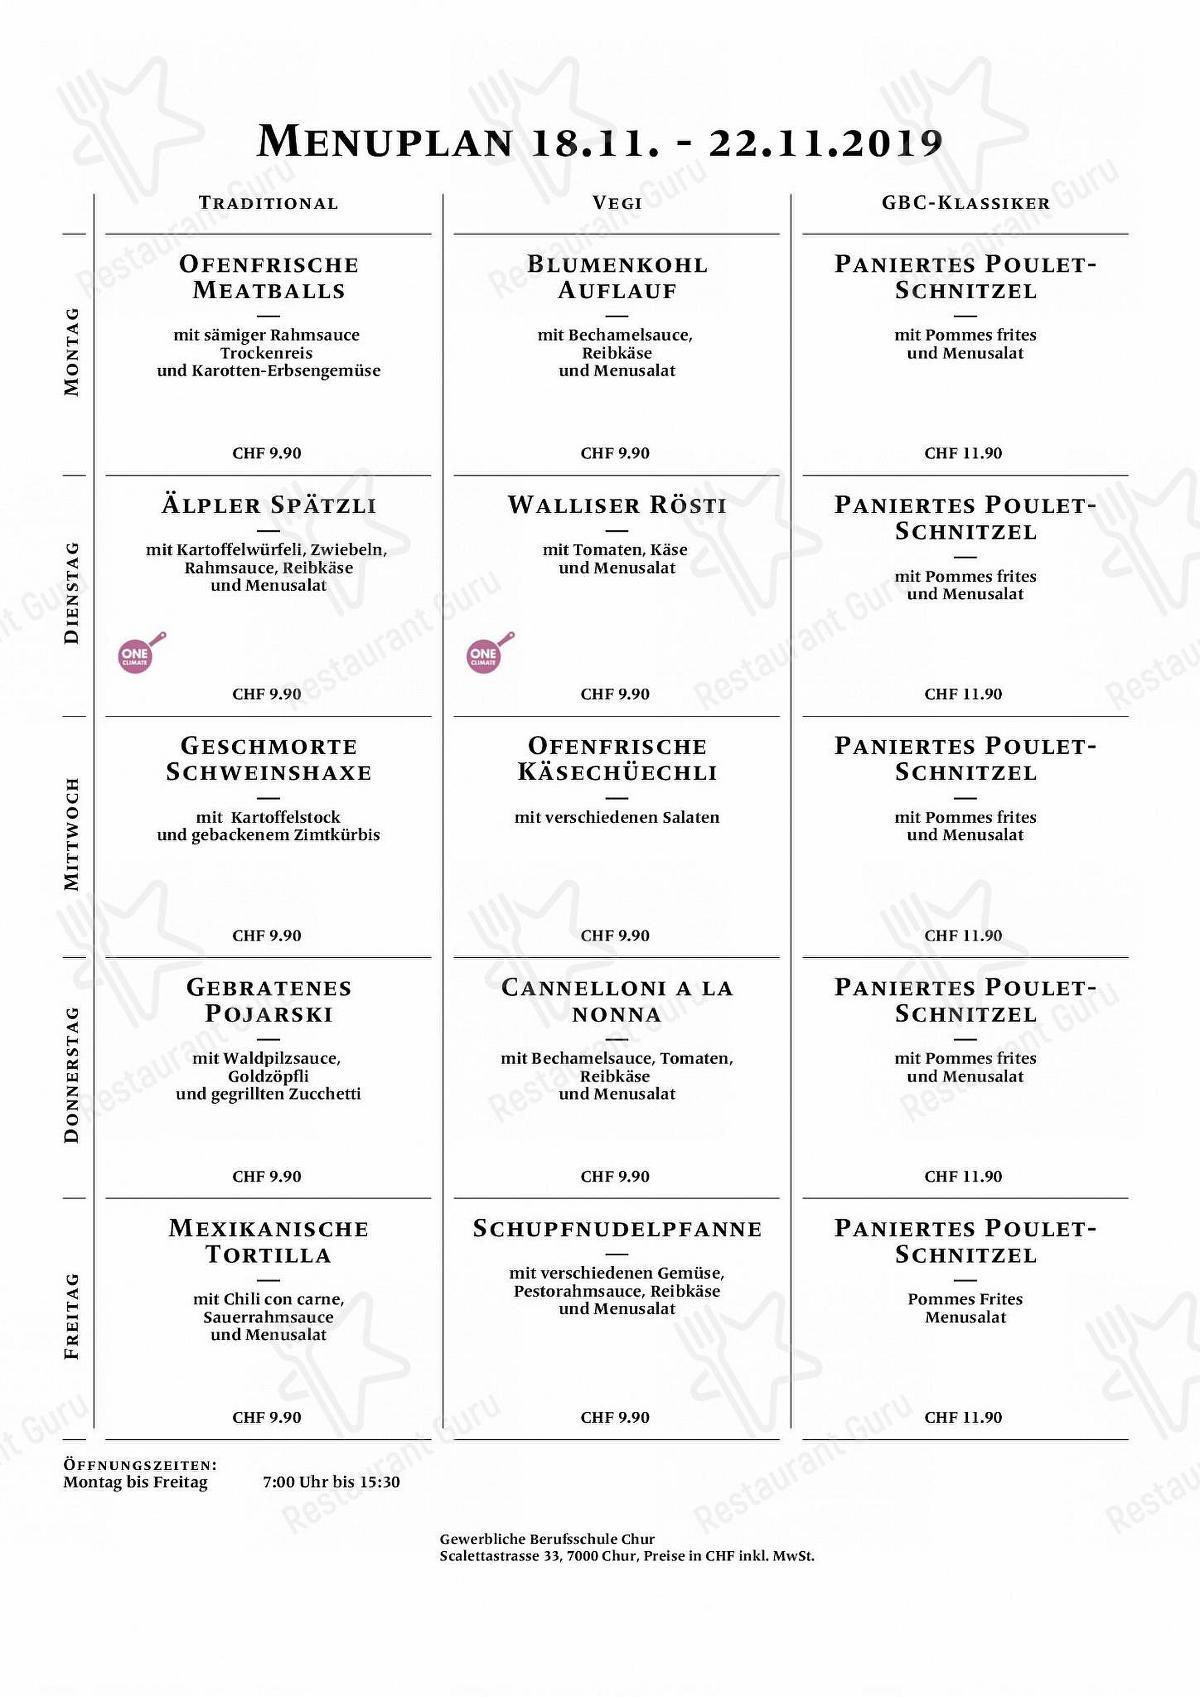 Gewerbliche Berufsschule menu - meals and drinks